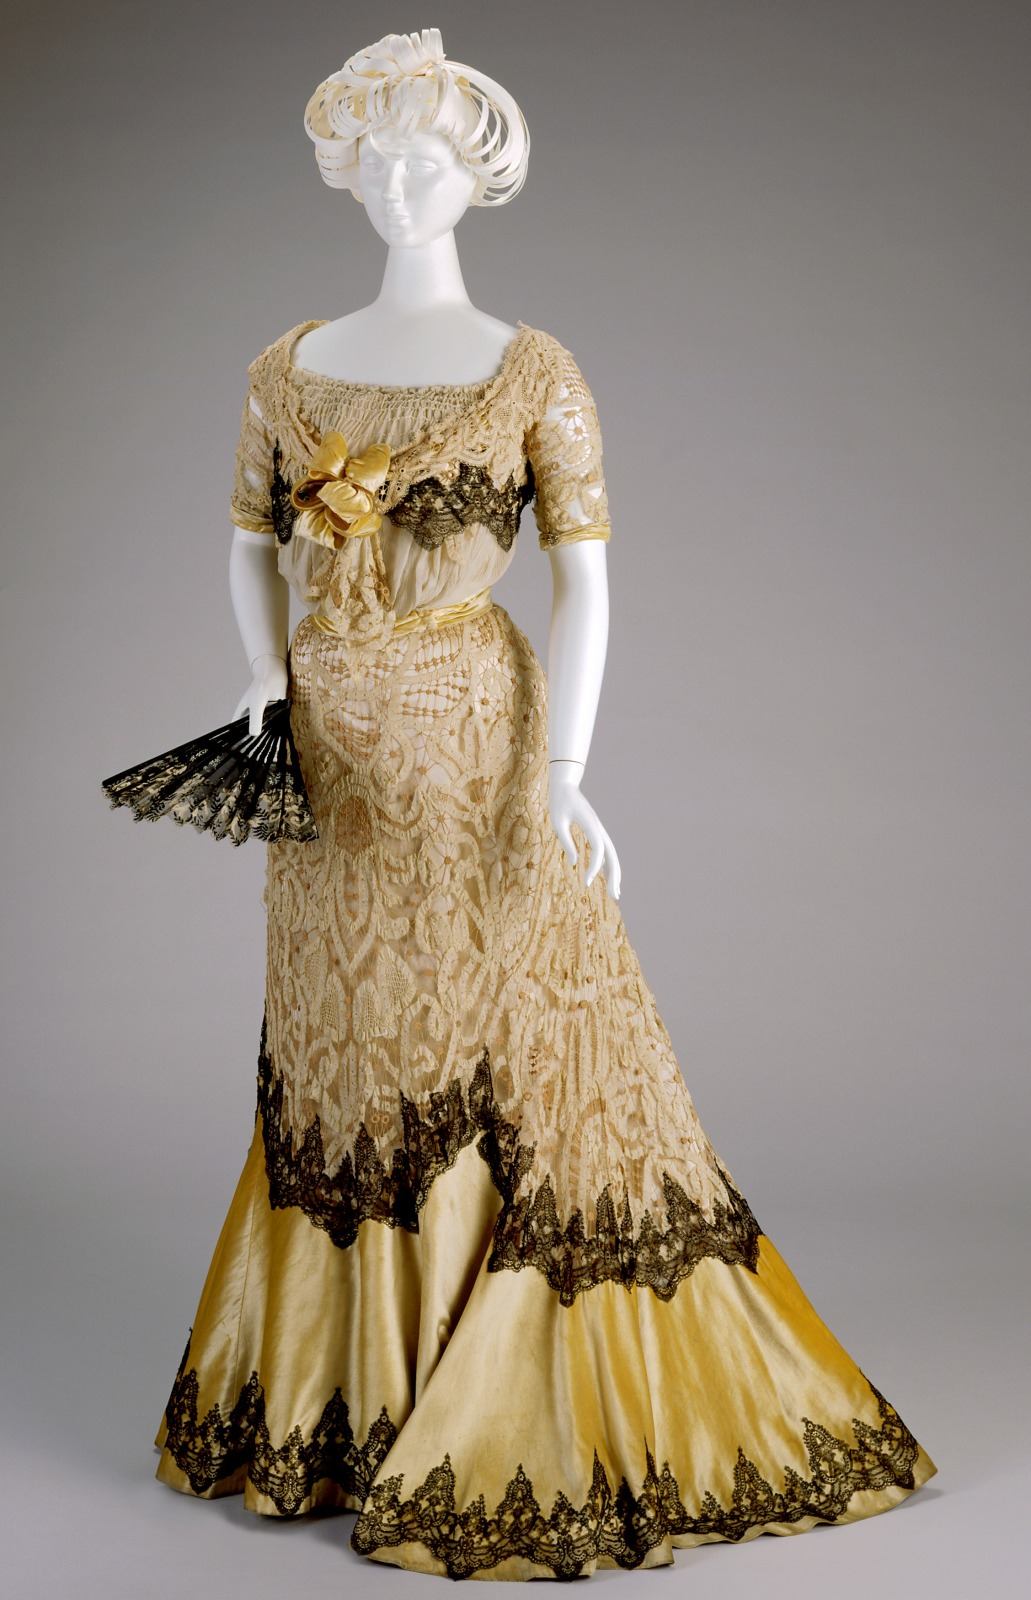 1900 1902 kate r cregmile yellow silk evening dress via cincinnati art museum